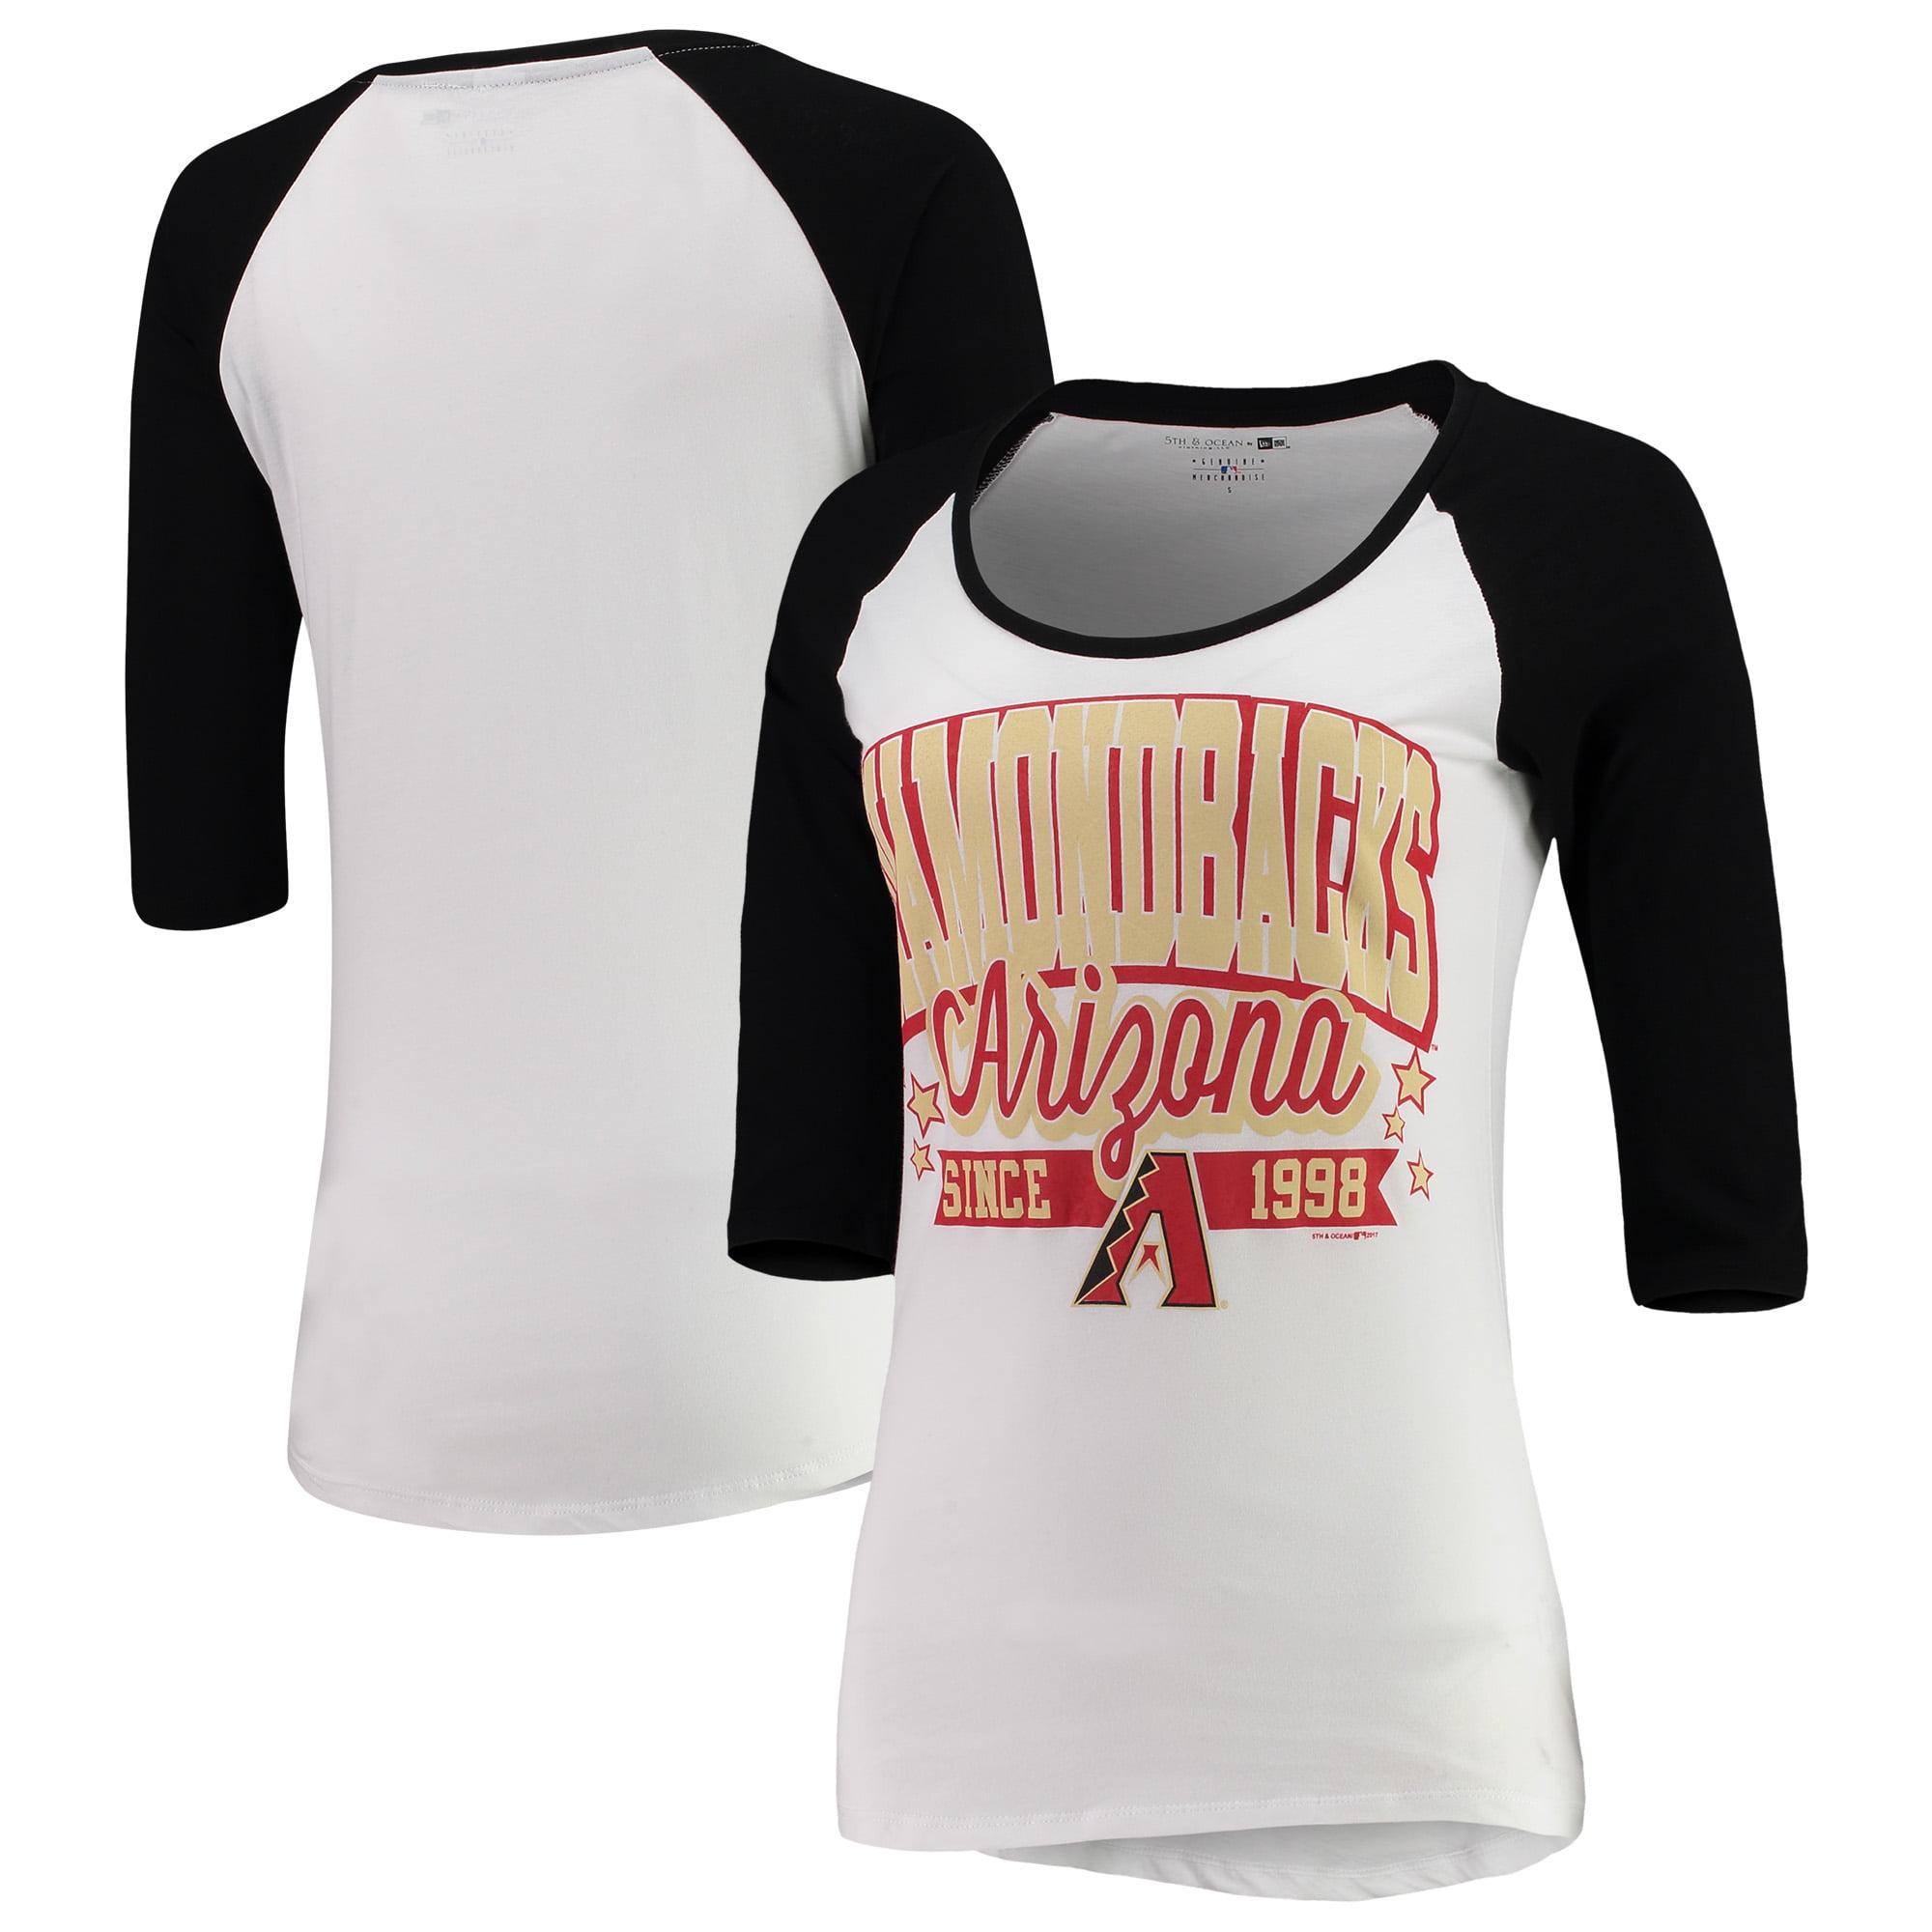 Arizona Diamondbacks 5th & Ocean by New Era Women's Team Banner 3/4-Sleeve Raglan T-Shirt - White/Black